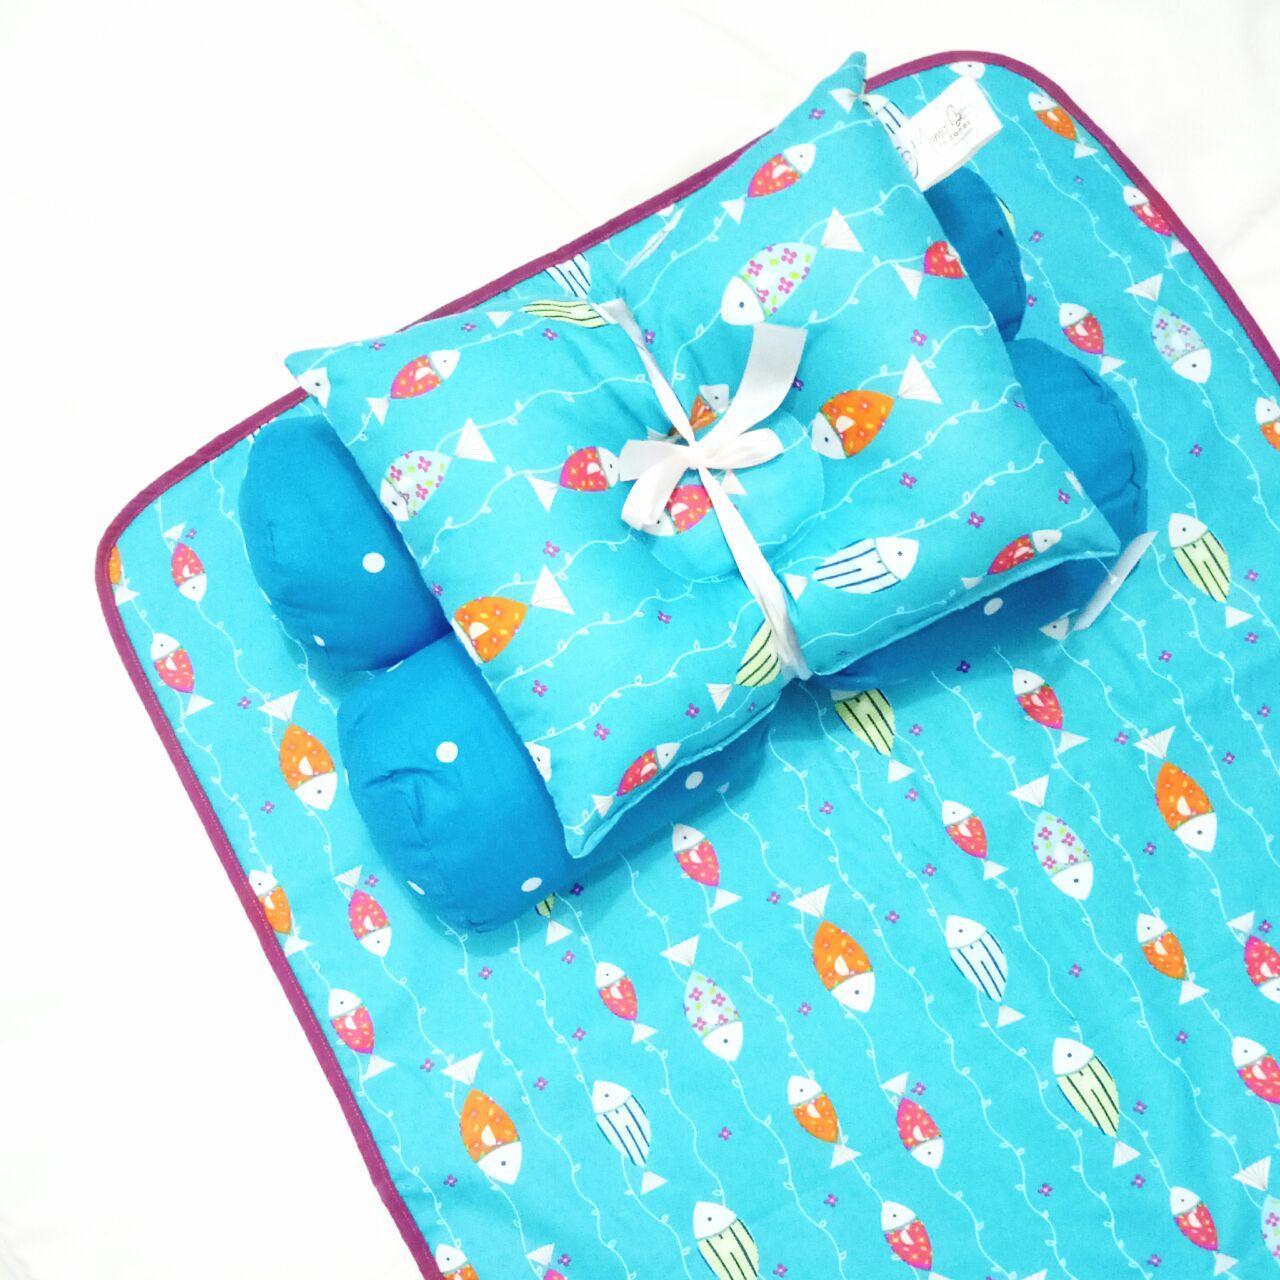 The Cheapest Price Perlak Alas Ompol Karpet Underpad Bayi Motif Baby Kembarshop Eksklusif Kado Bedding Set 4in1 Matras Bantal Peang Plus 2 Guling Boy Laki Random